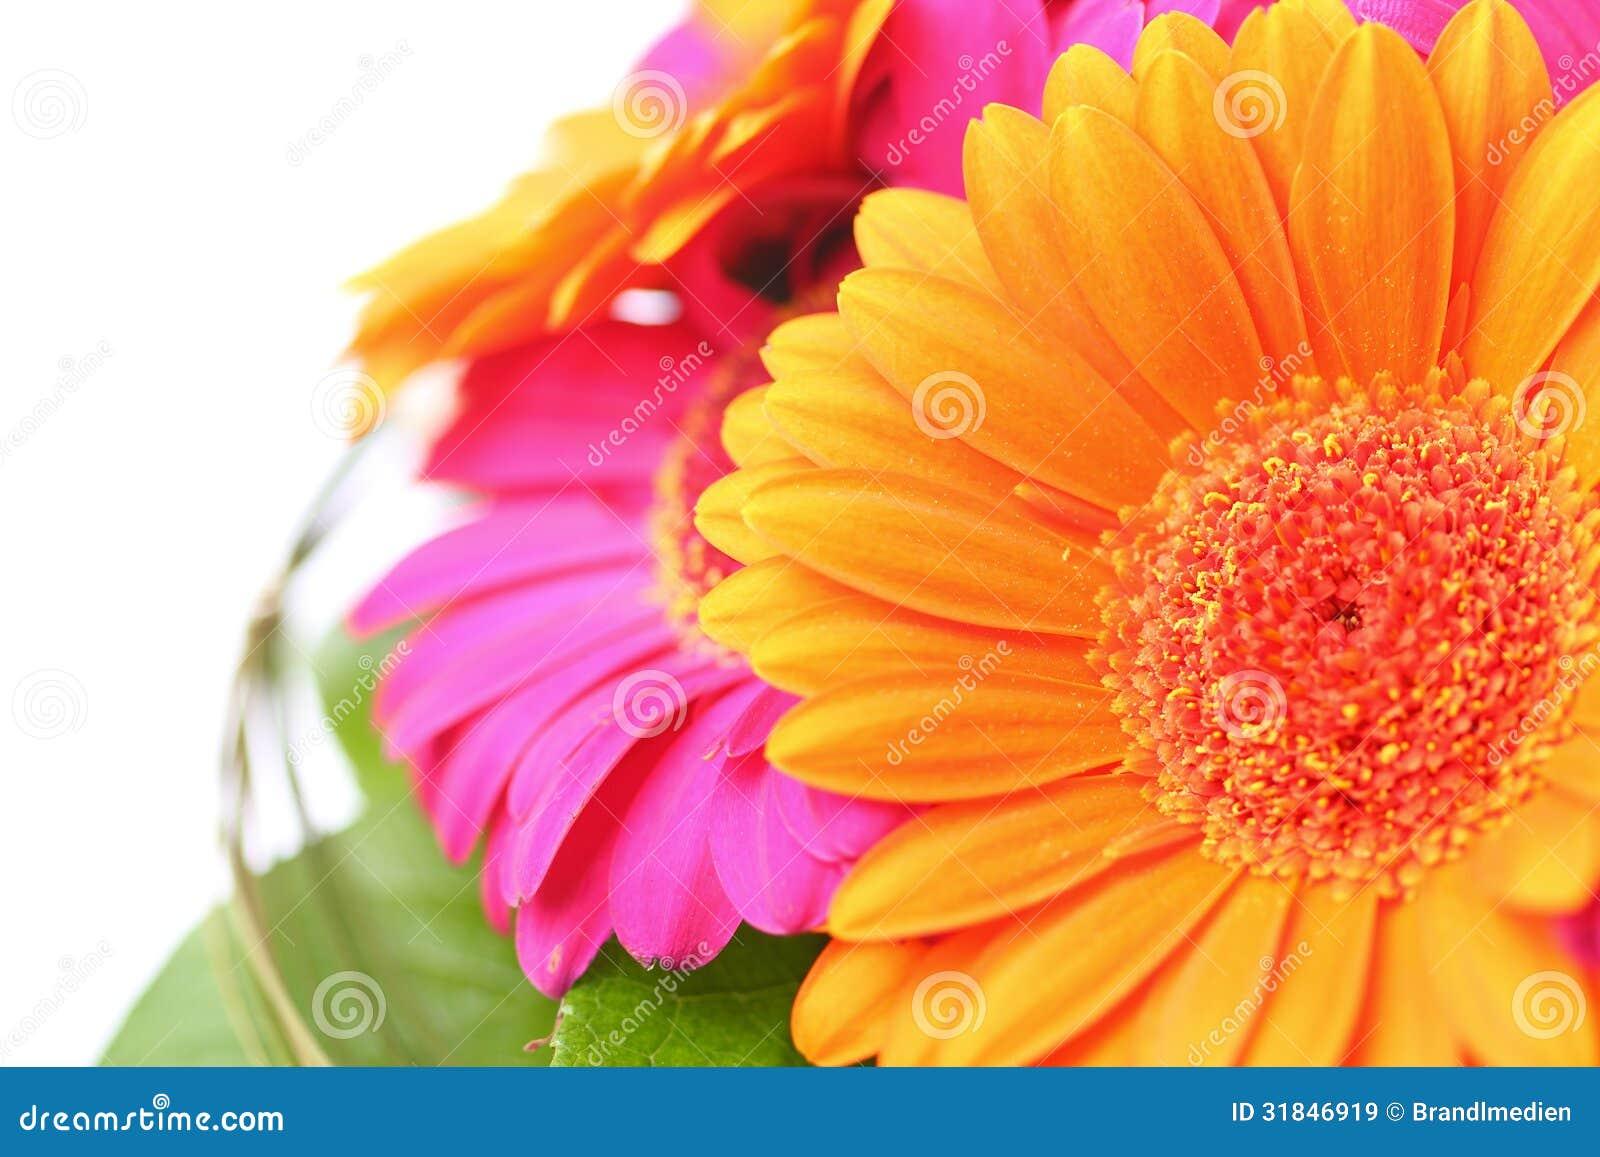 Flower bouquet in pink and orange